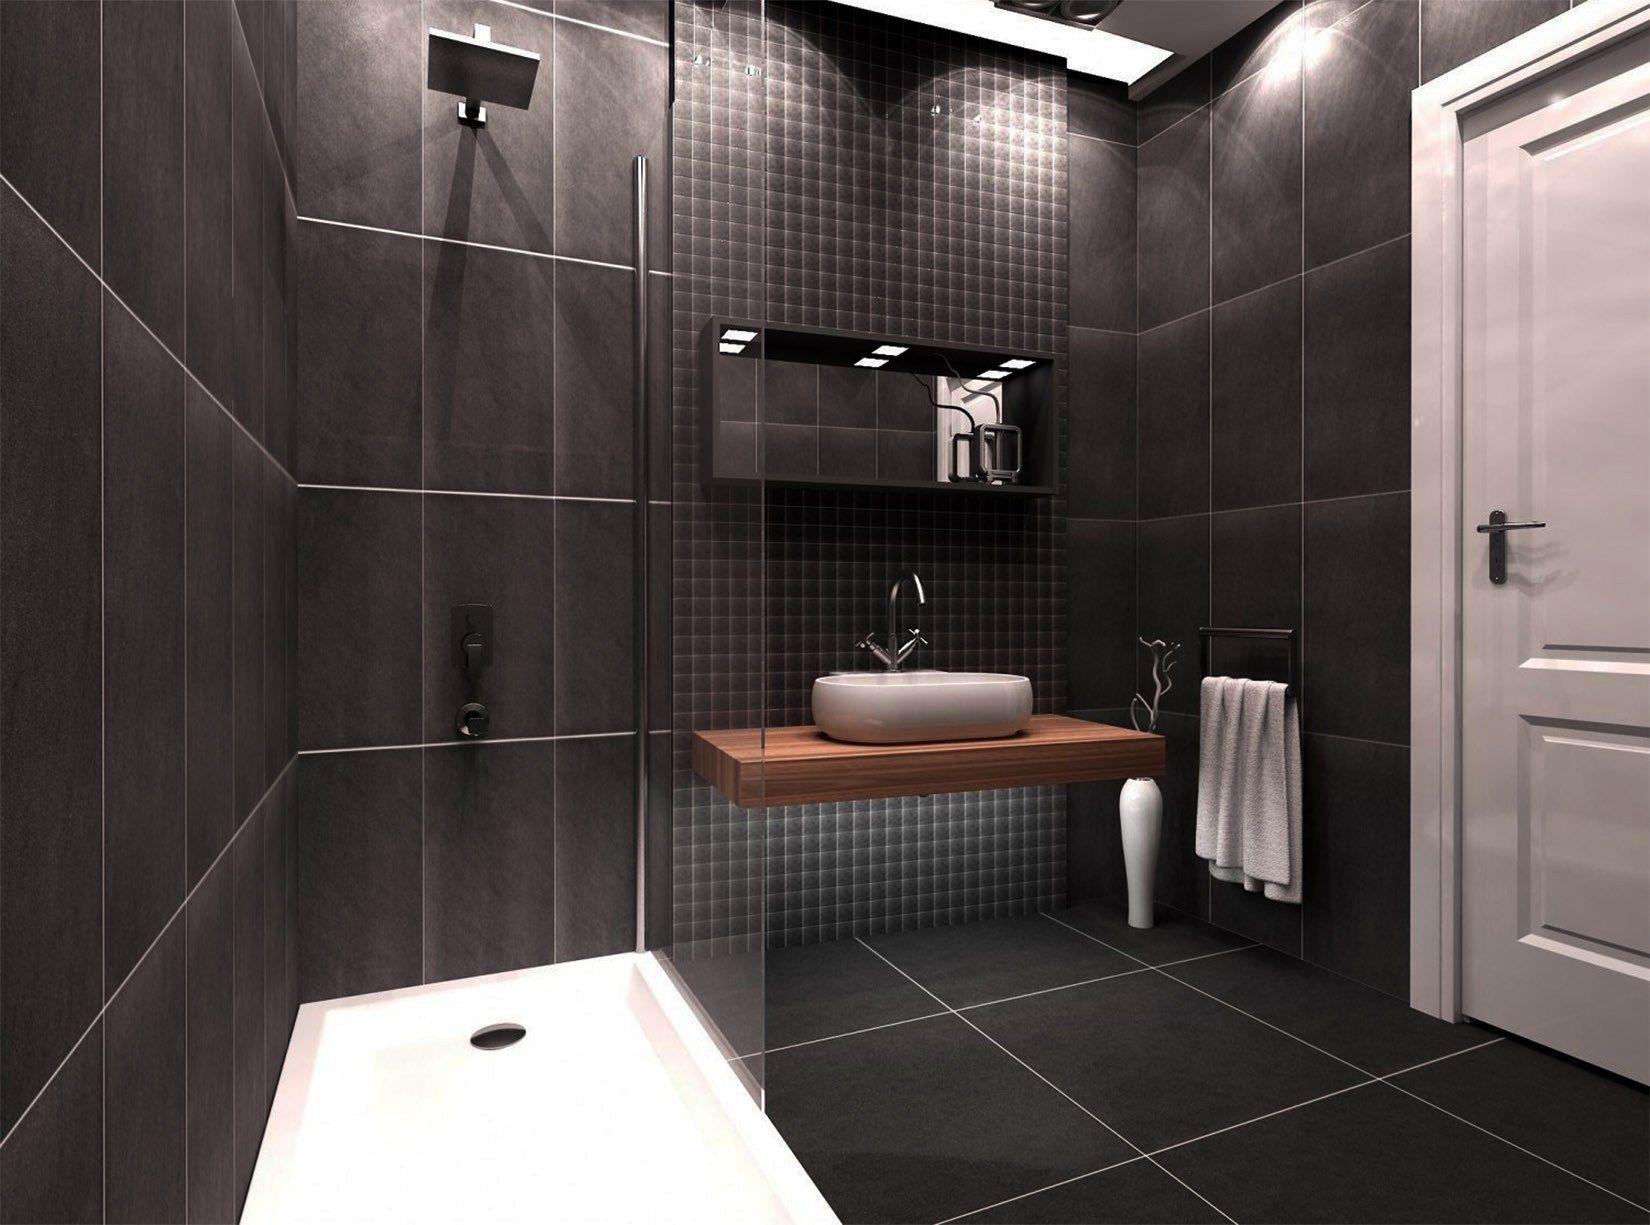 Sleek Modern Bathroom Design Ideas Are In Trend 2018 Decornp Also Modern Bathroom Top Bathroom Design Modern Small Bathrooms